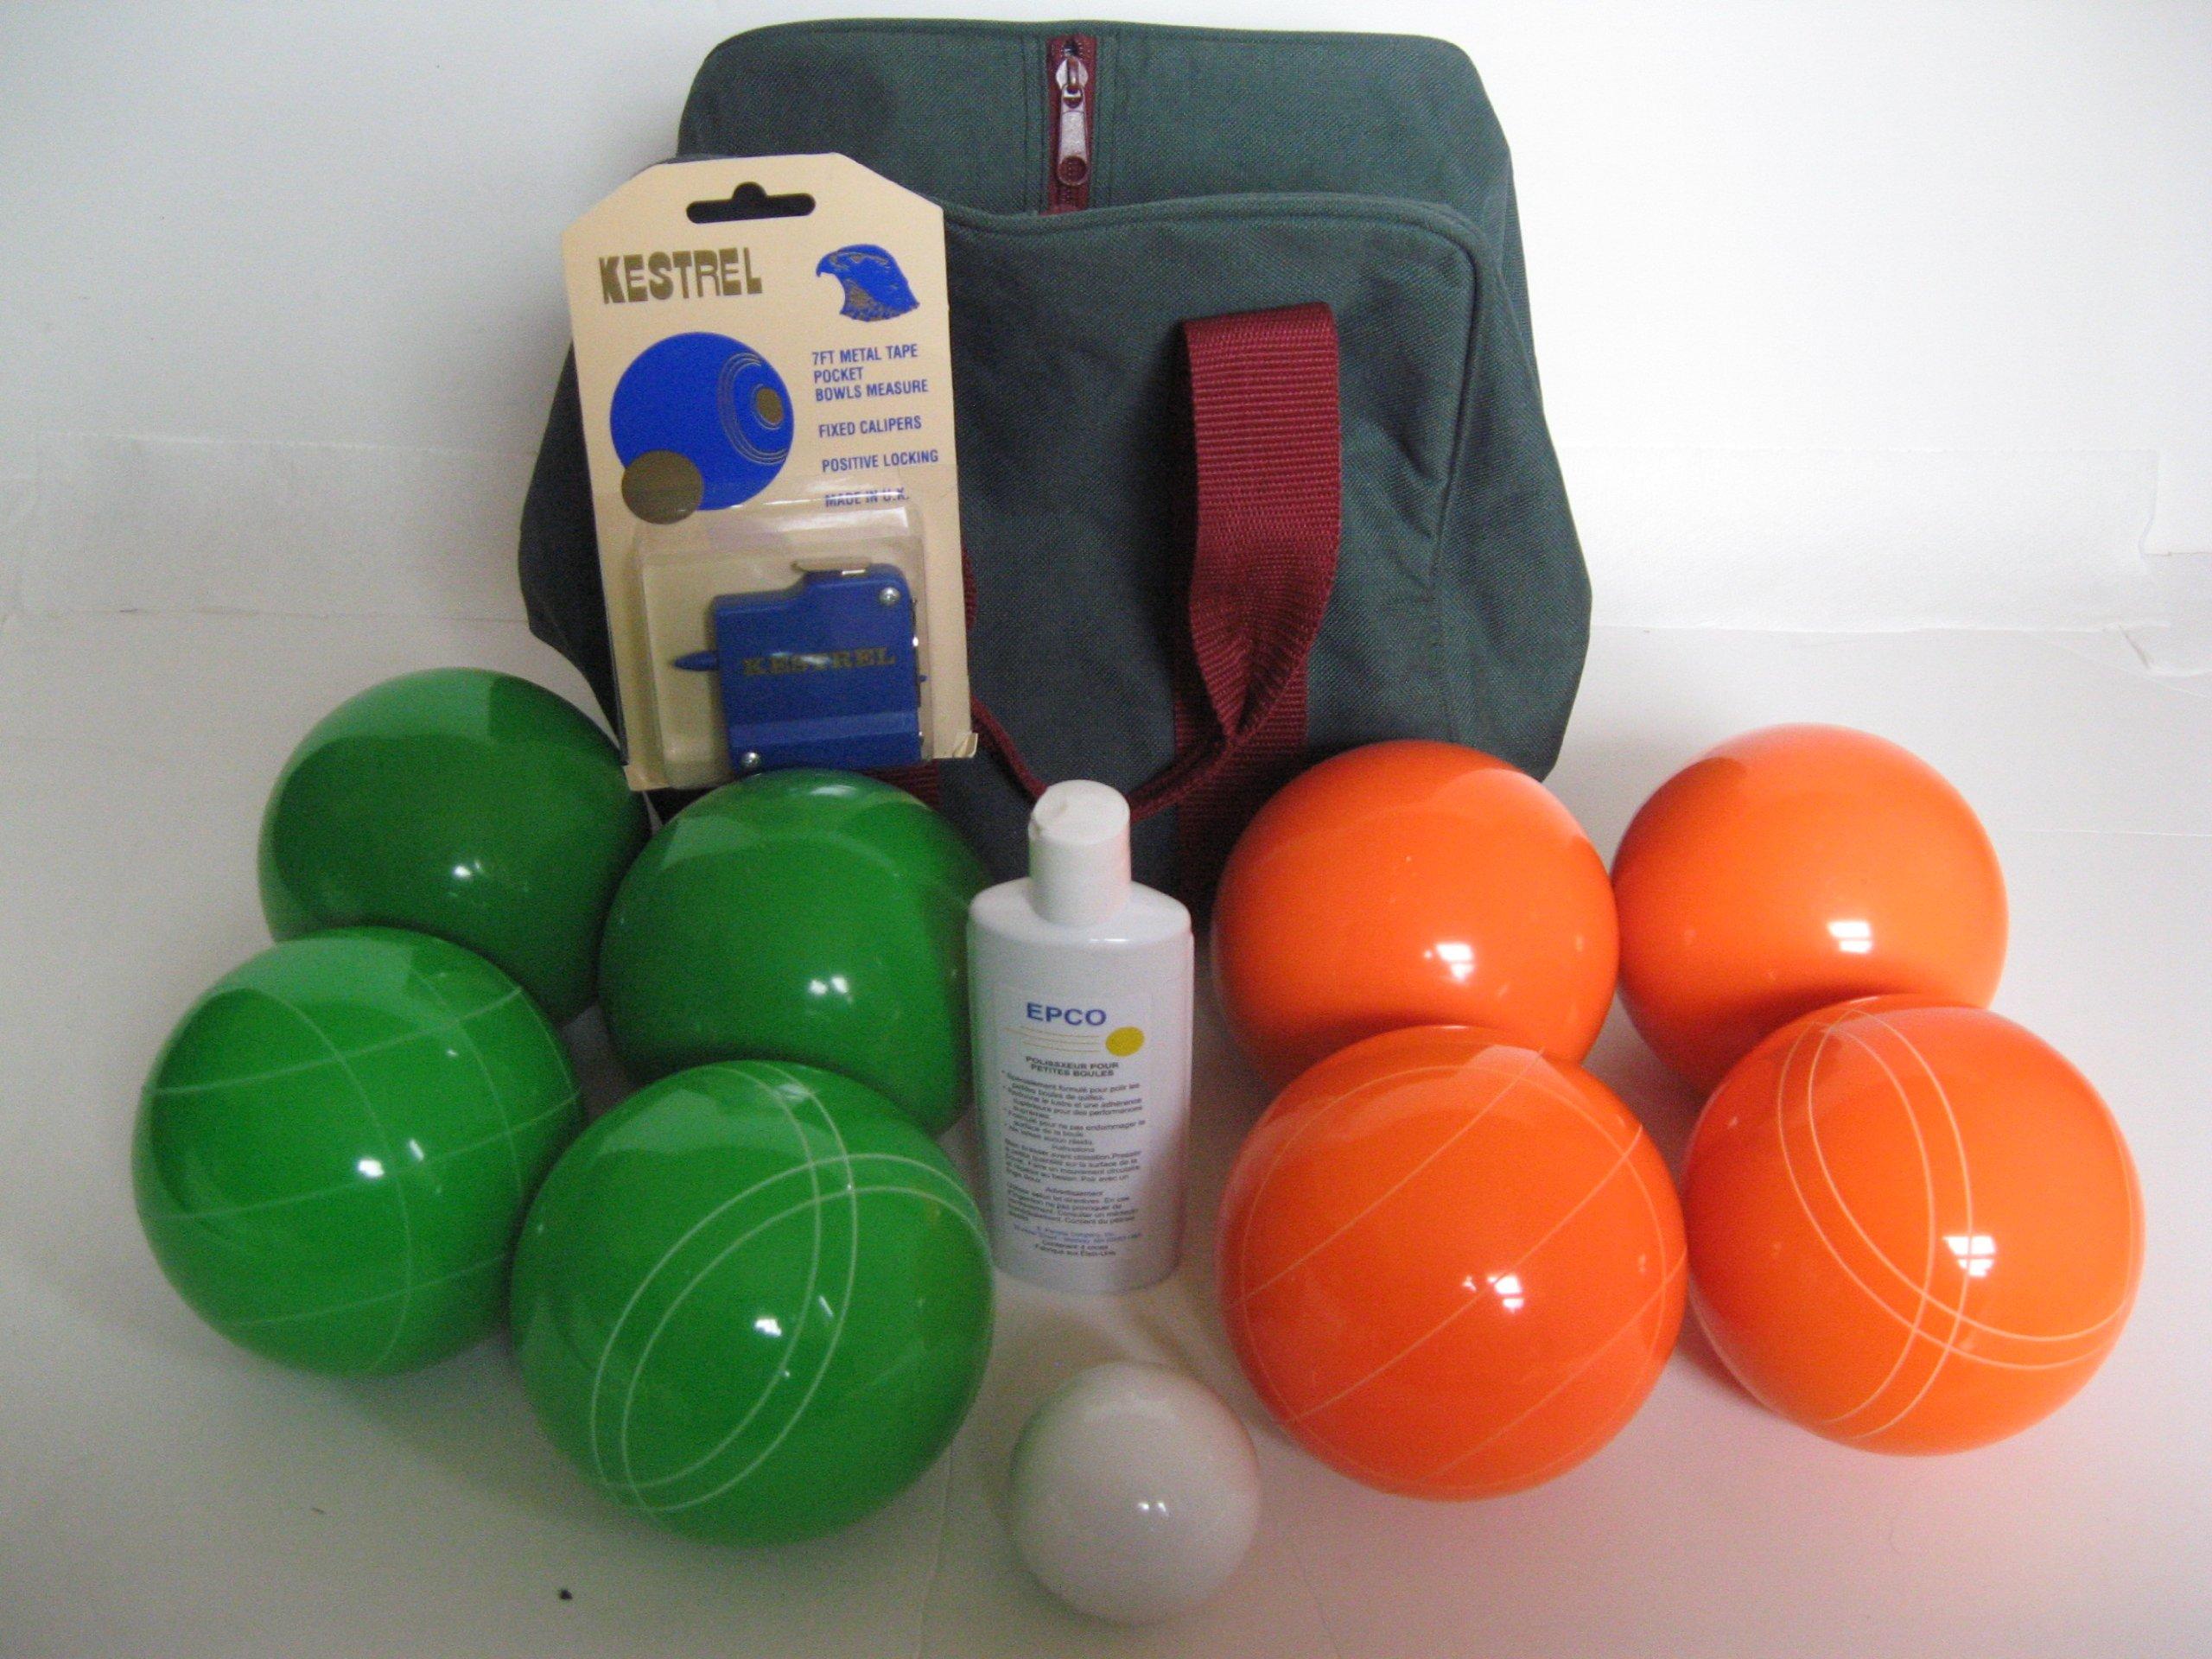 Premium Quality Basic EPCO Bocce package - 110mm Green and Orange balls, quality nylon bag, m...